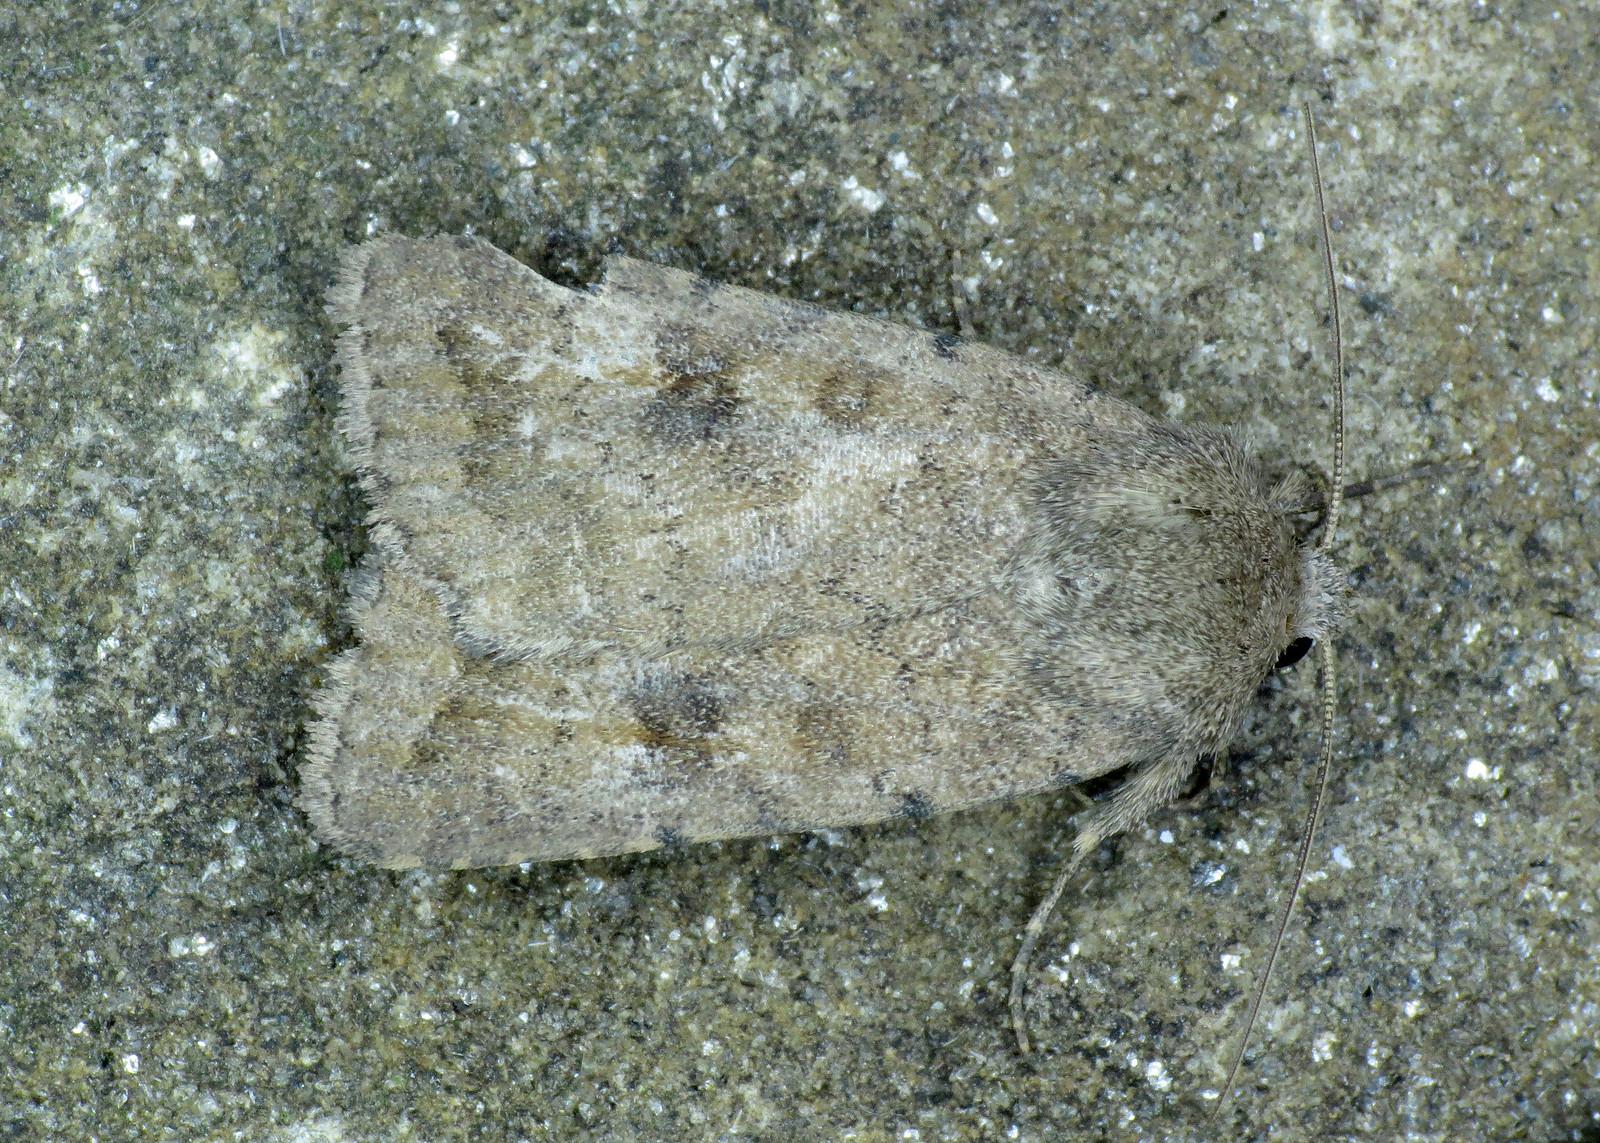 2387 Mottled Rustic - Caradrina morpheus